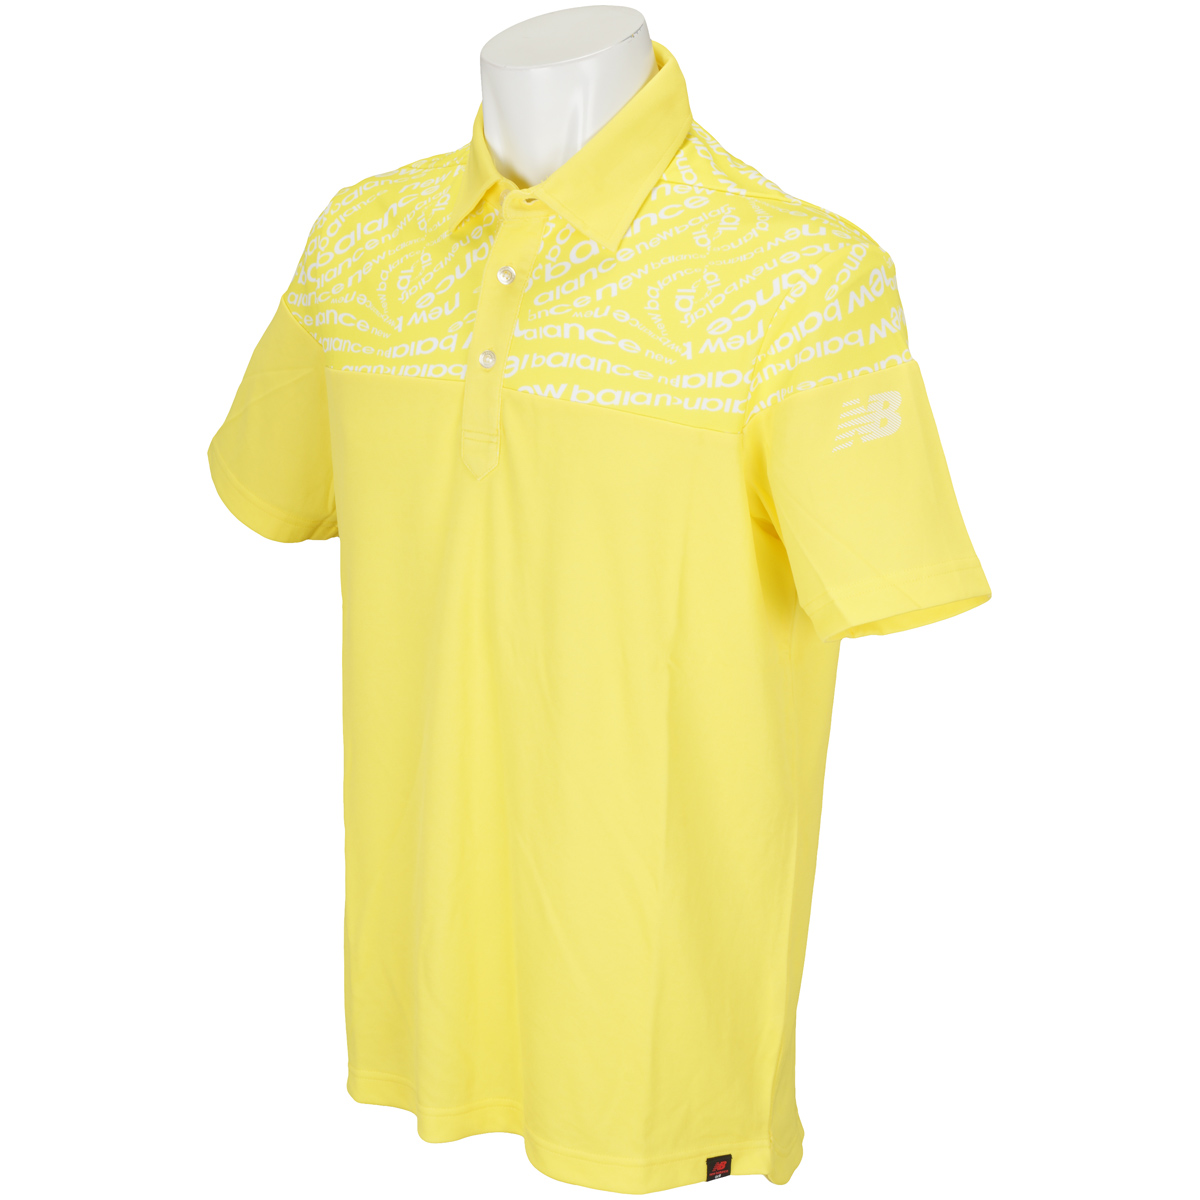 SPORT ソリッド×タイポゼブラプリント半袖ポロシャツ